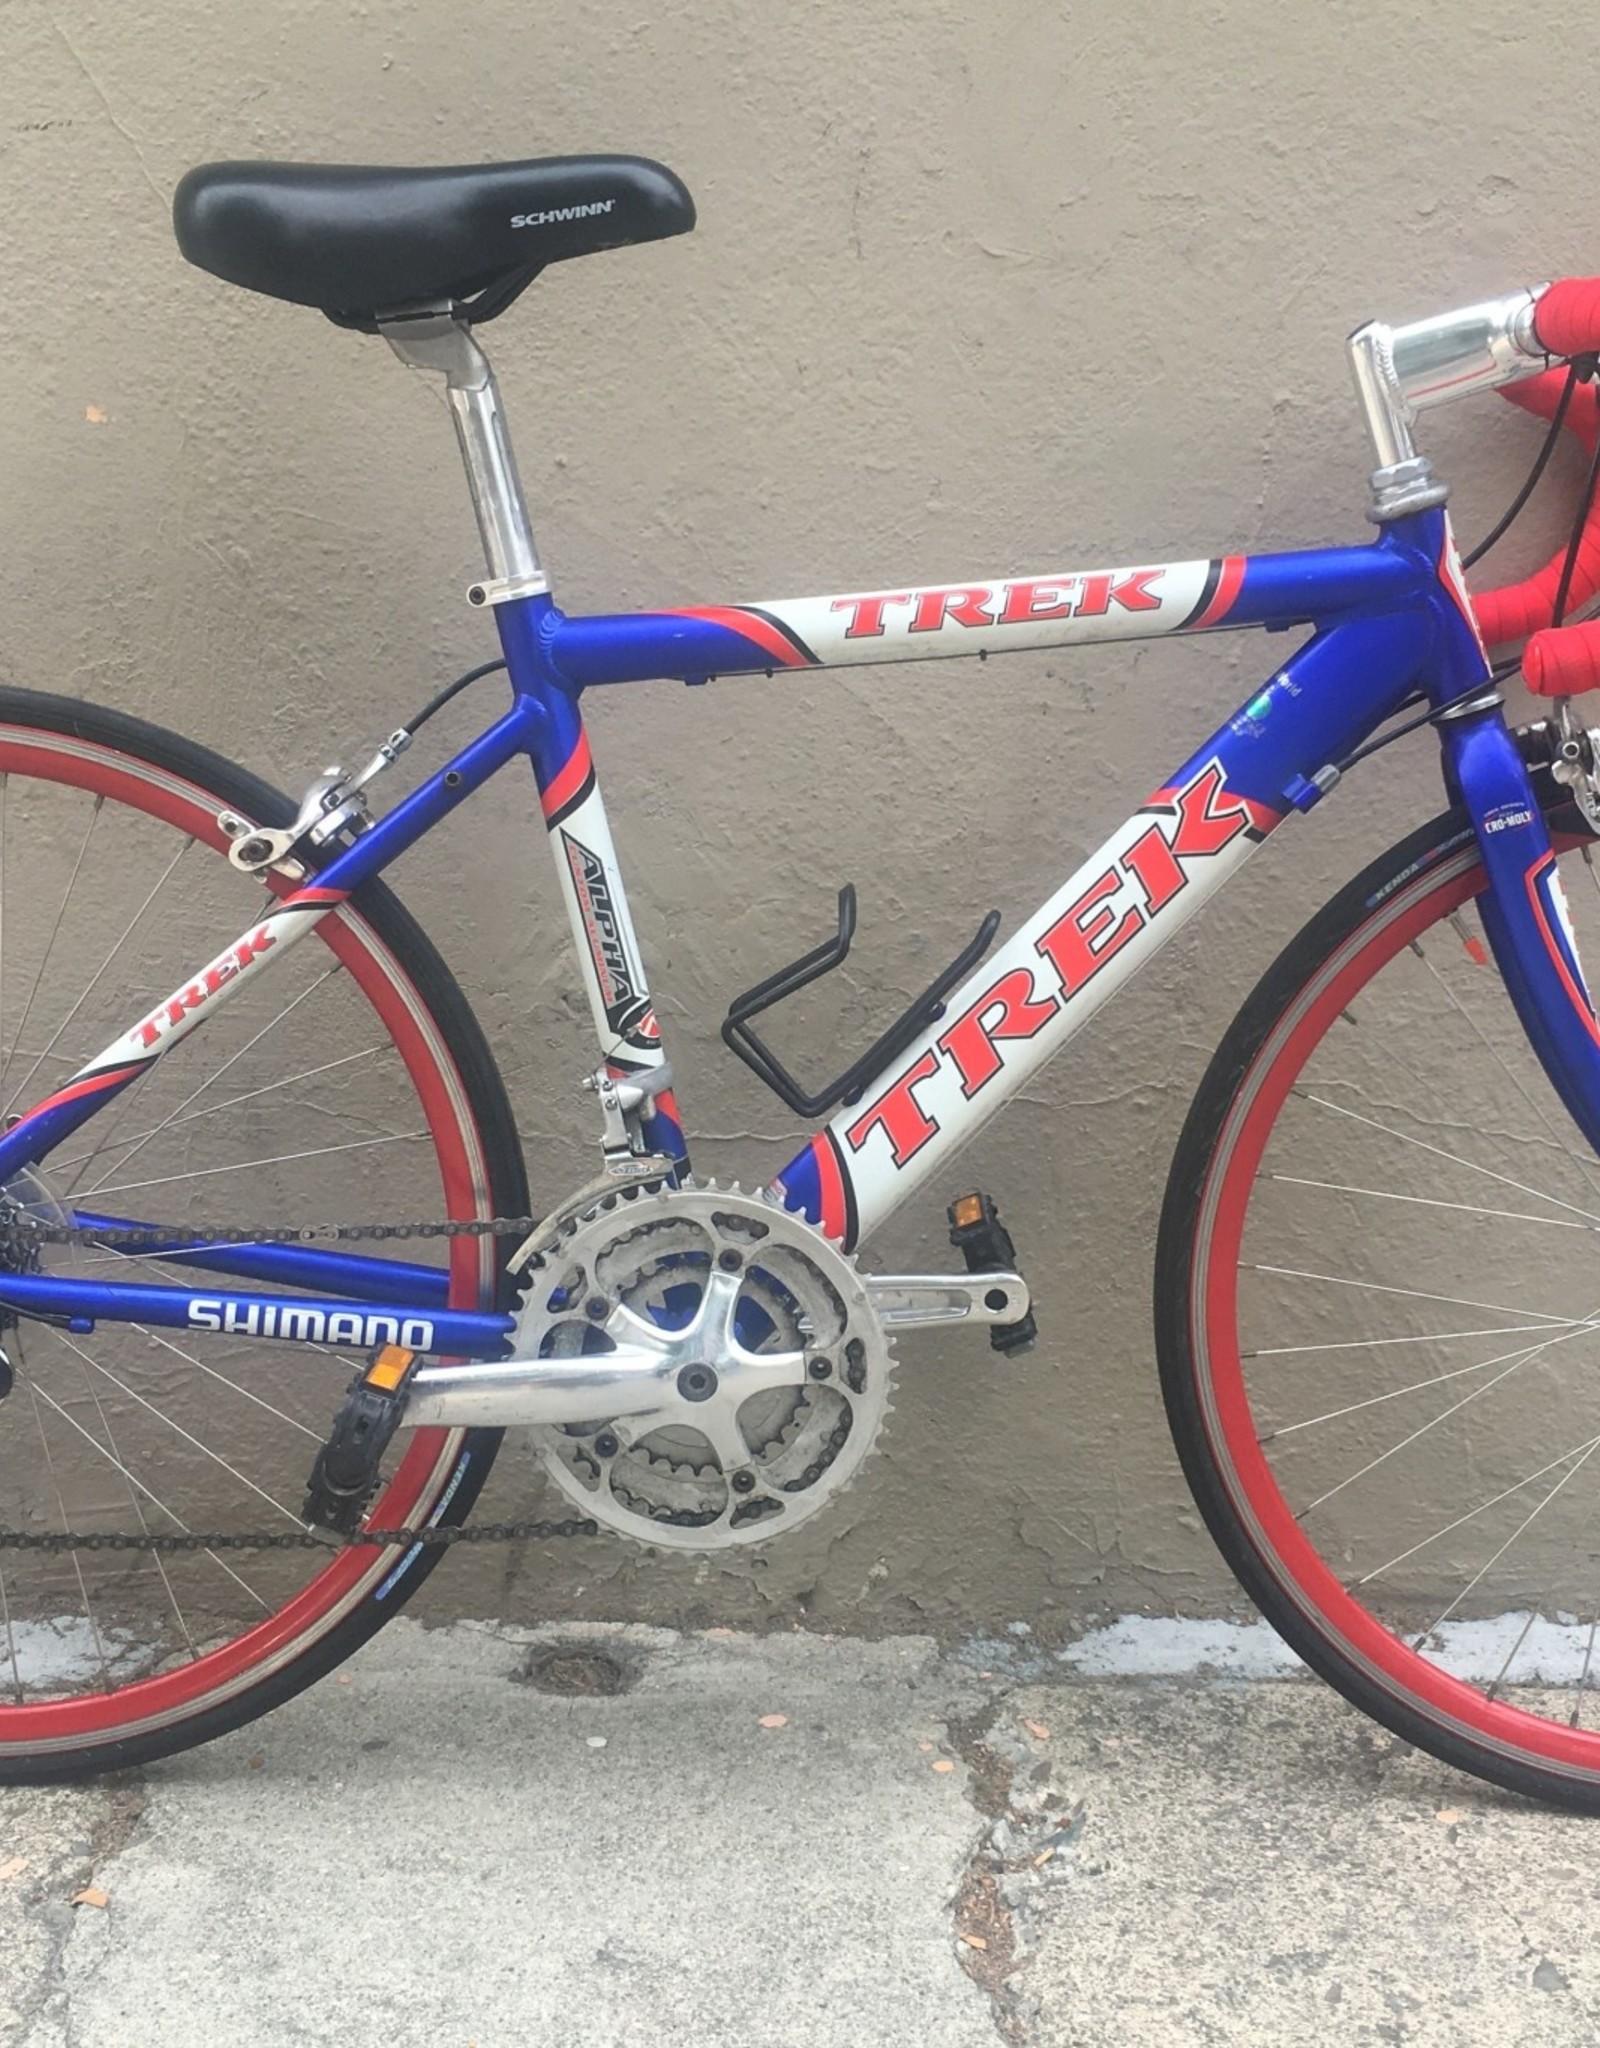 Trek Trek 1000 Alpha Road, Blue & Red, 2001, 43cm